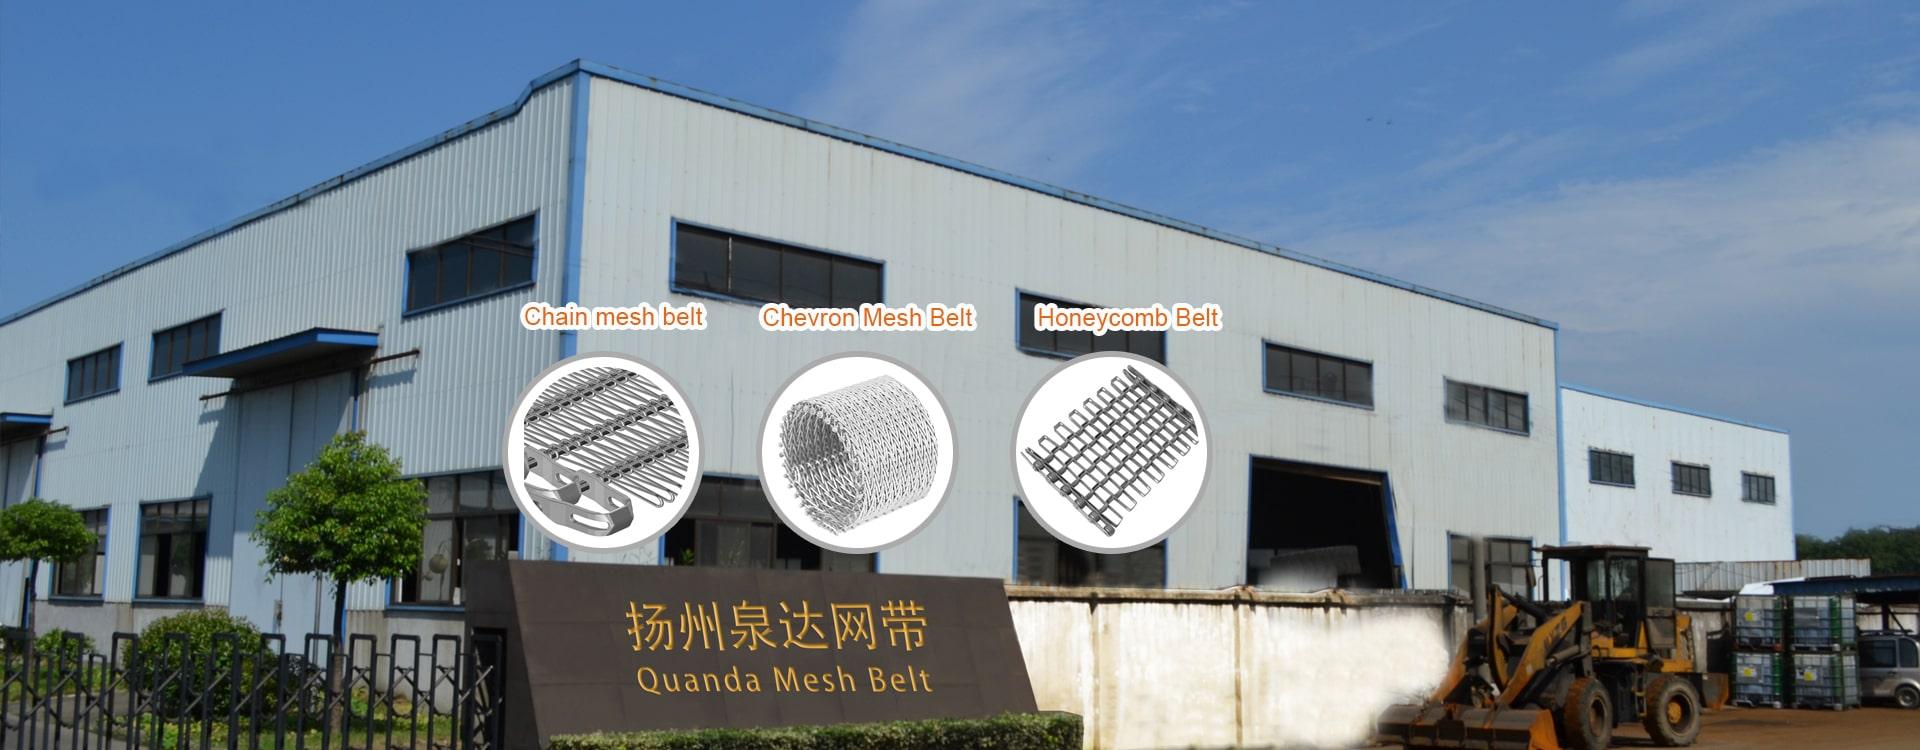 Chain mesh bele, Chevron mesh belt, Honeycomb belt